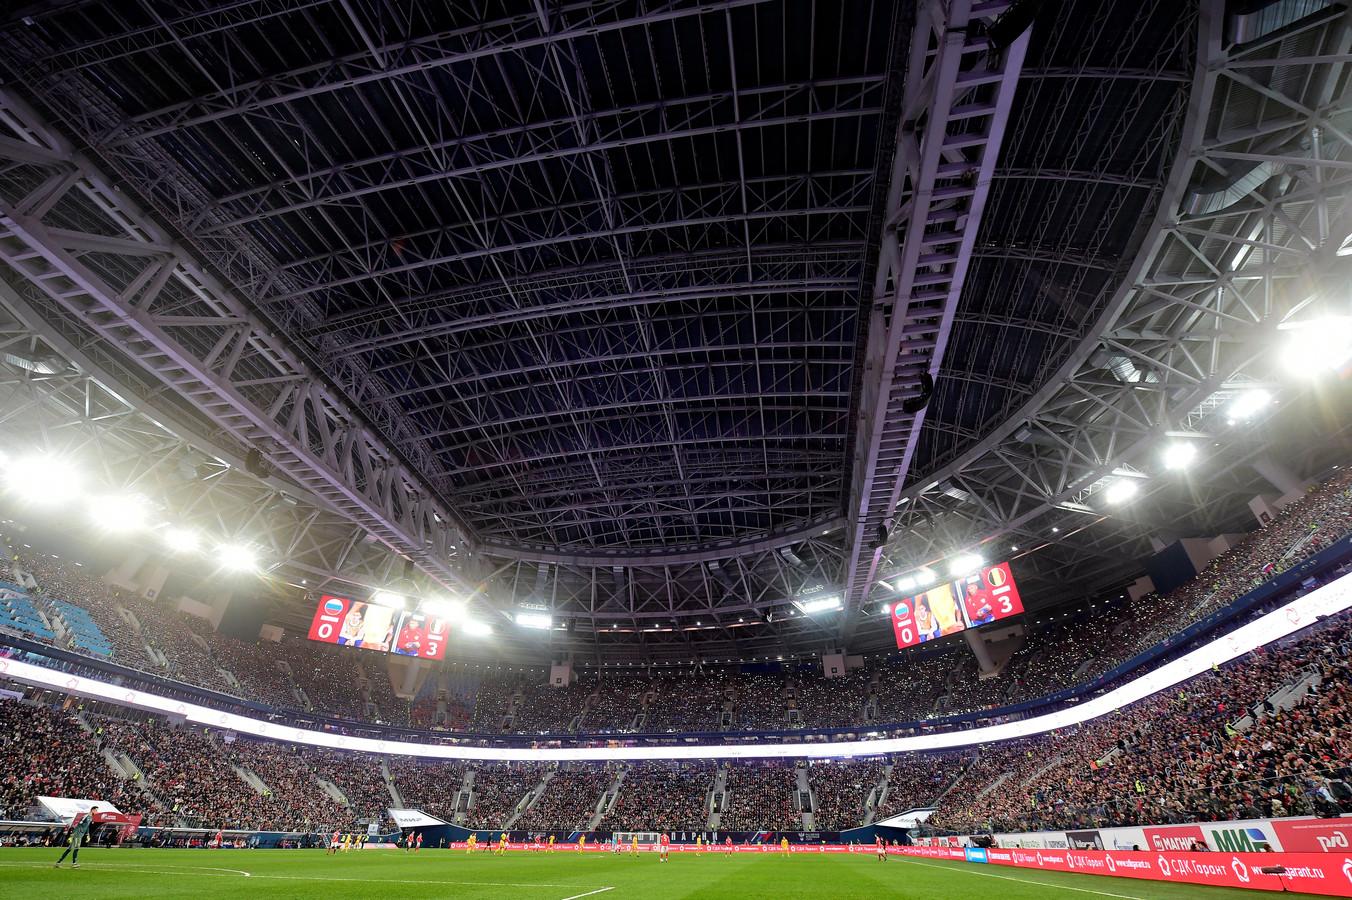 St-Petersbourg stadium.